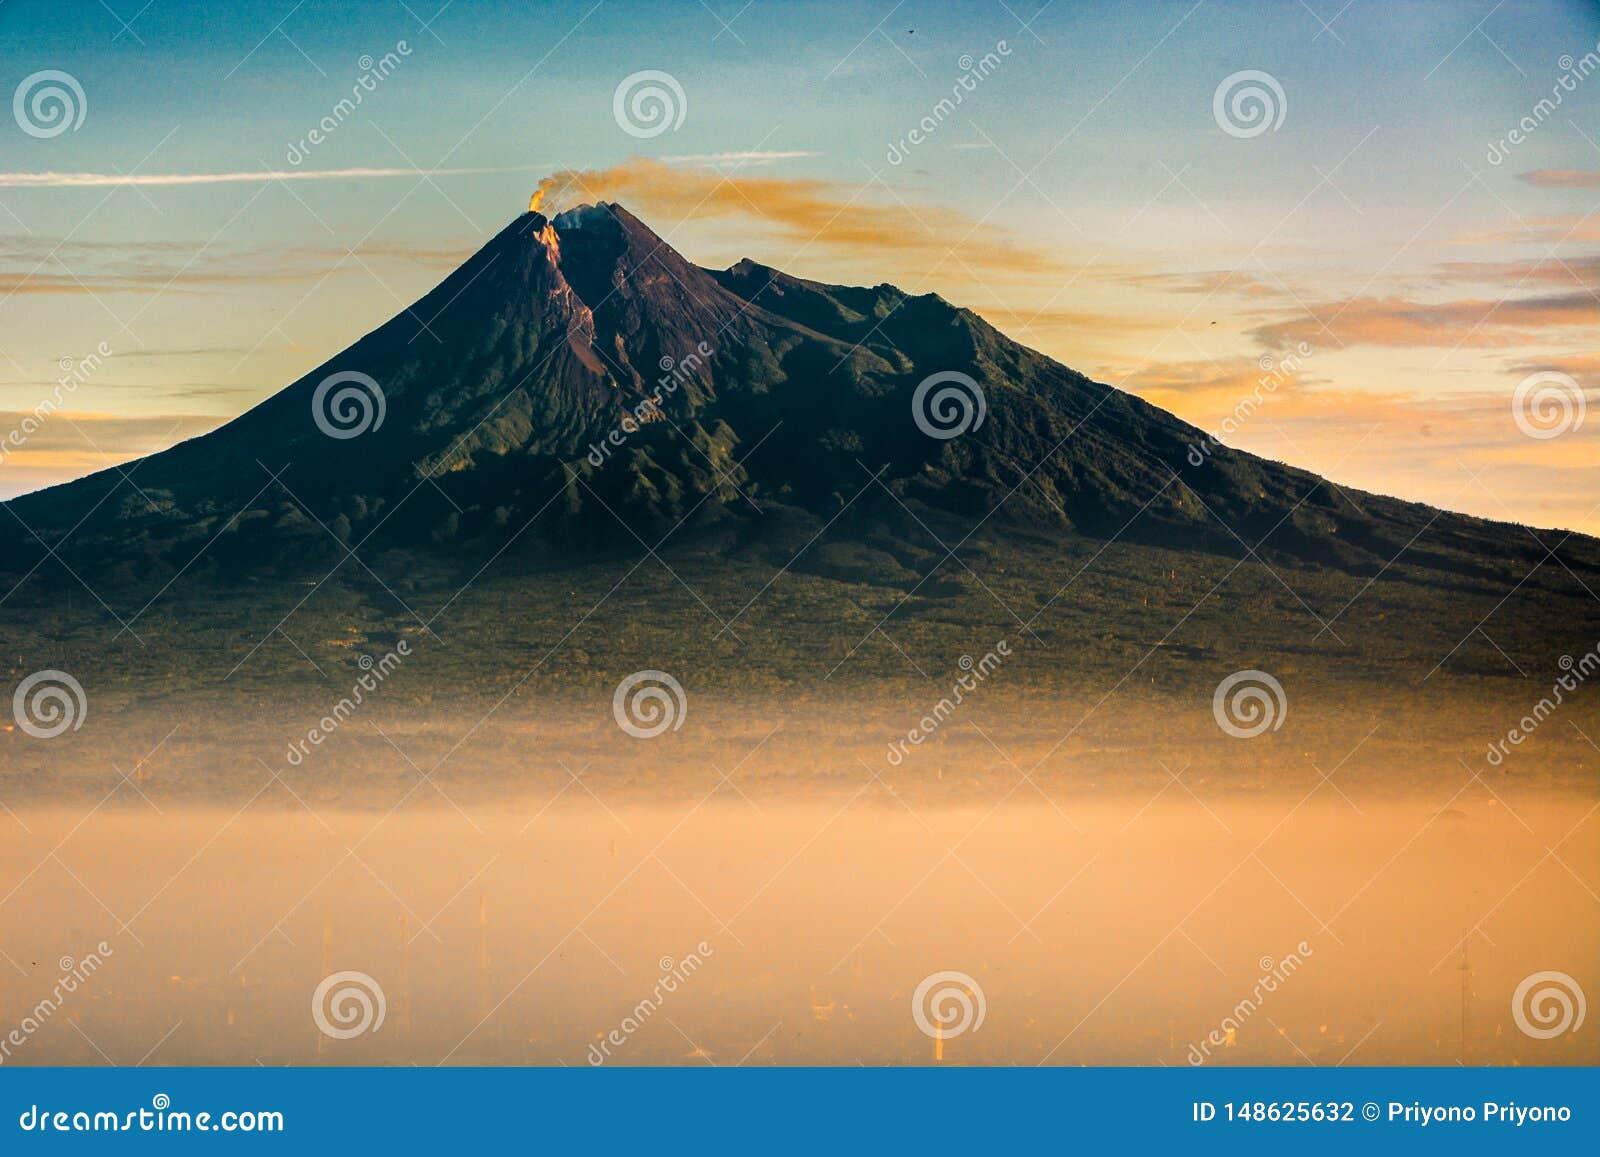 View mount merapi, java, indonesia